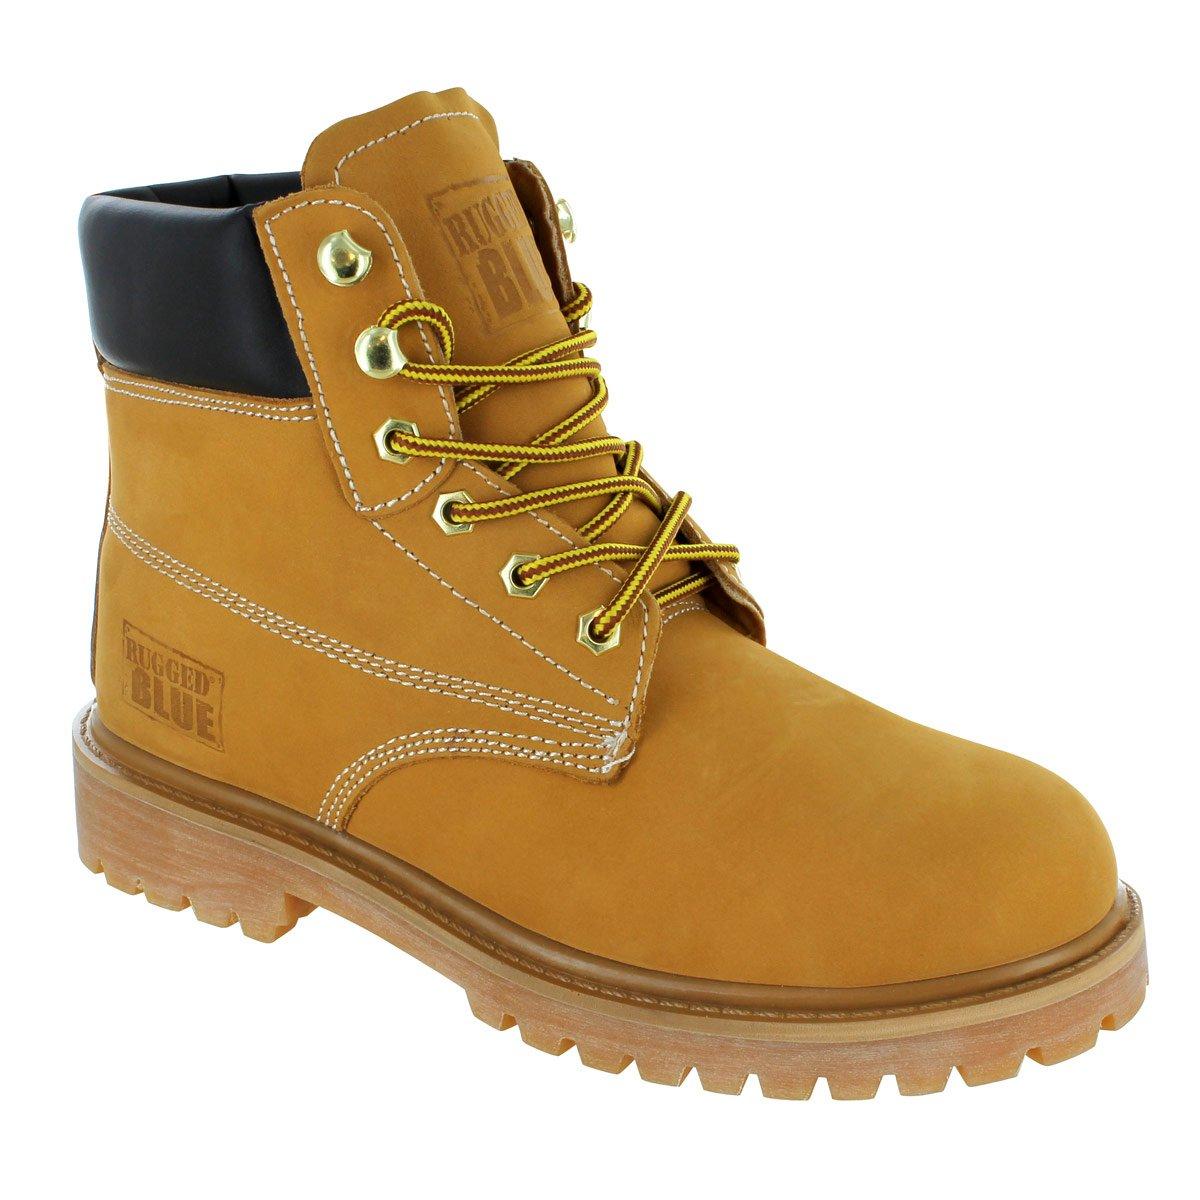 Rugged Blue MS001 Nubuck Leather Steel Toe Waterproof Mens Work Boot, Size 9M, Tan